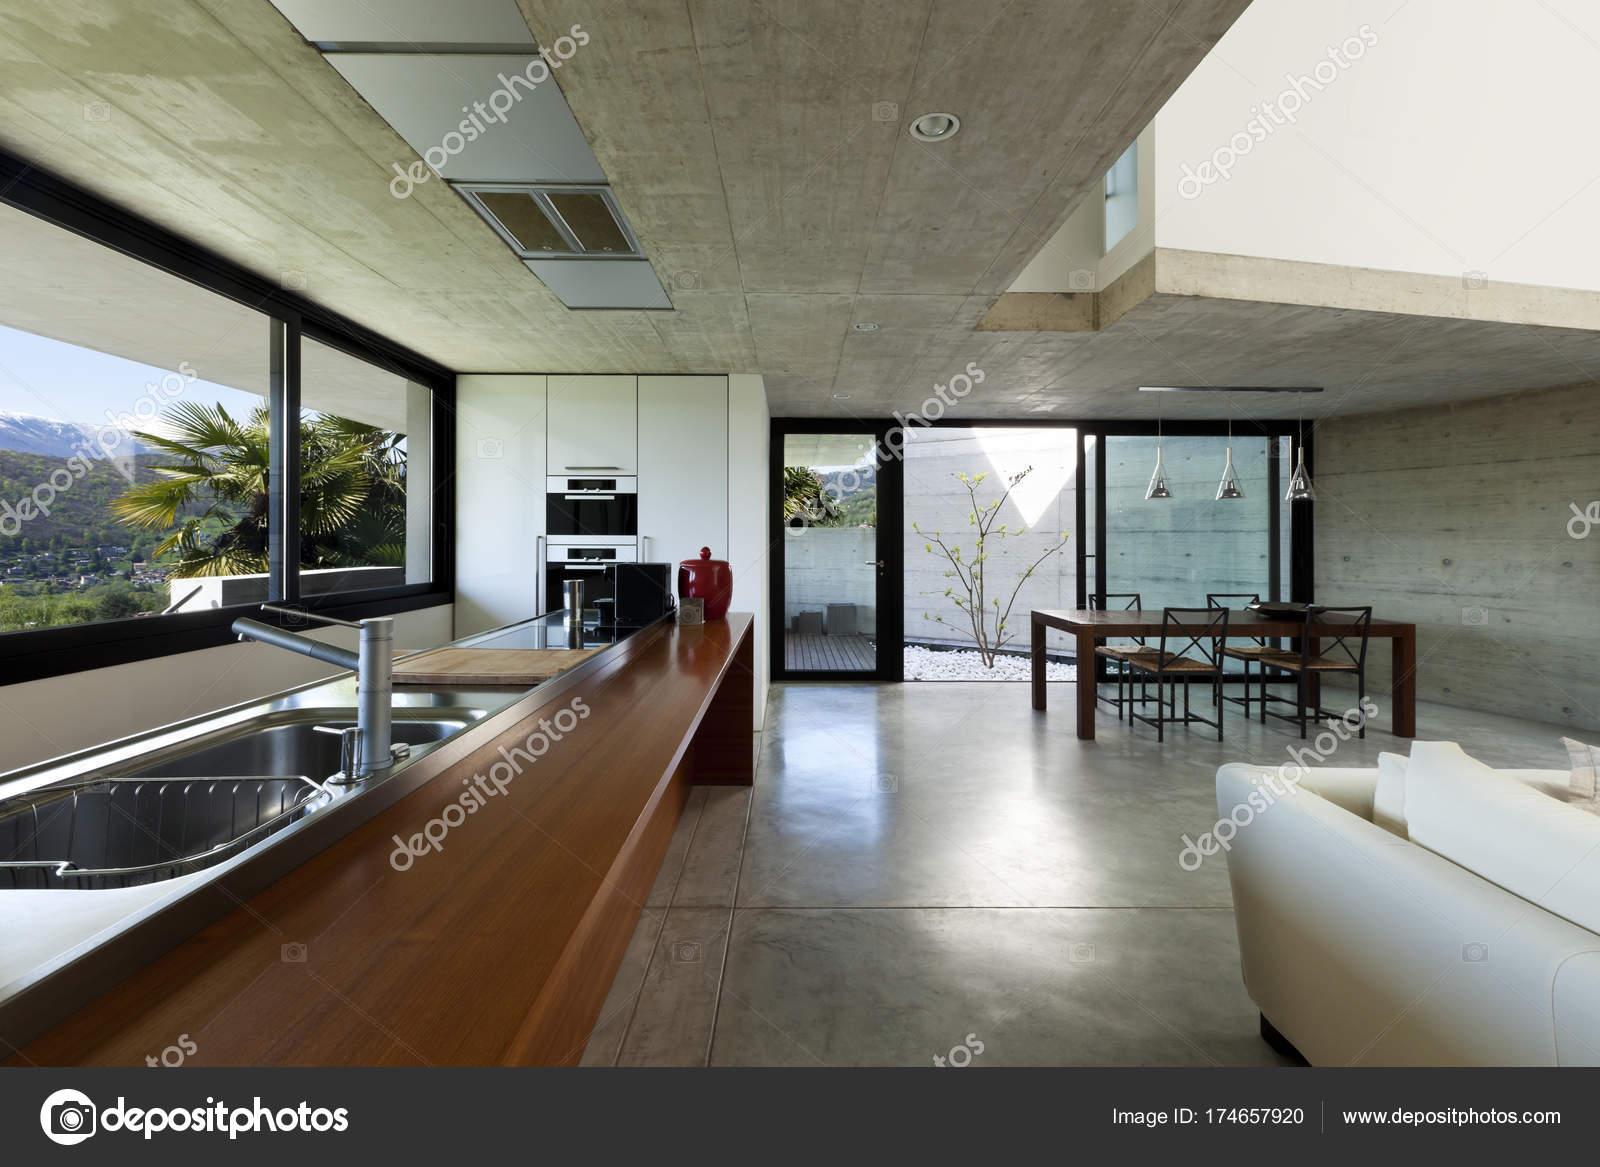 https://st3.depositphotos.com/2018053/17465/i/1600/depositphotos_174657920-stockafbeelding-mooie-moderne-huis-cement-interieur.jpg